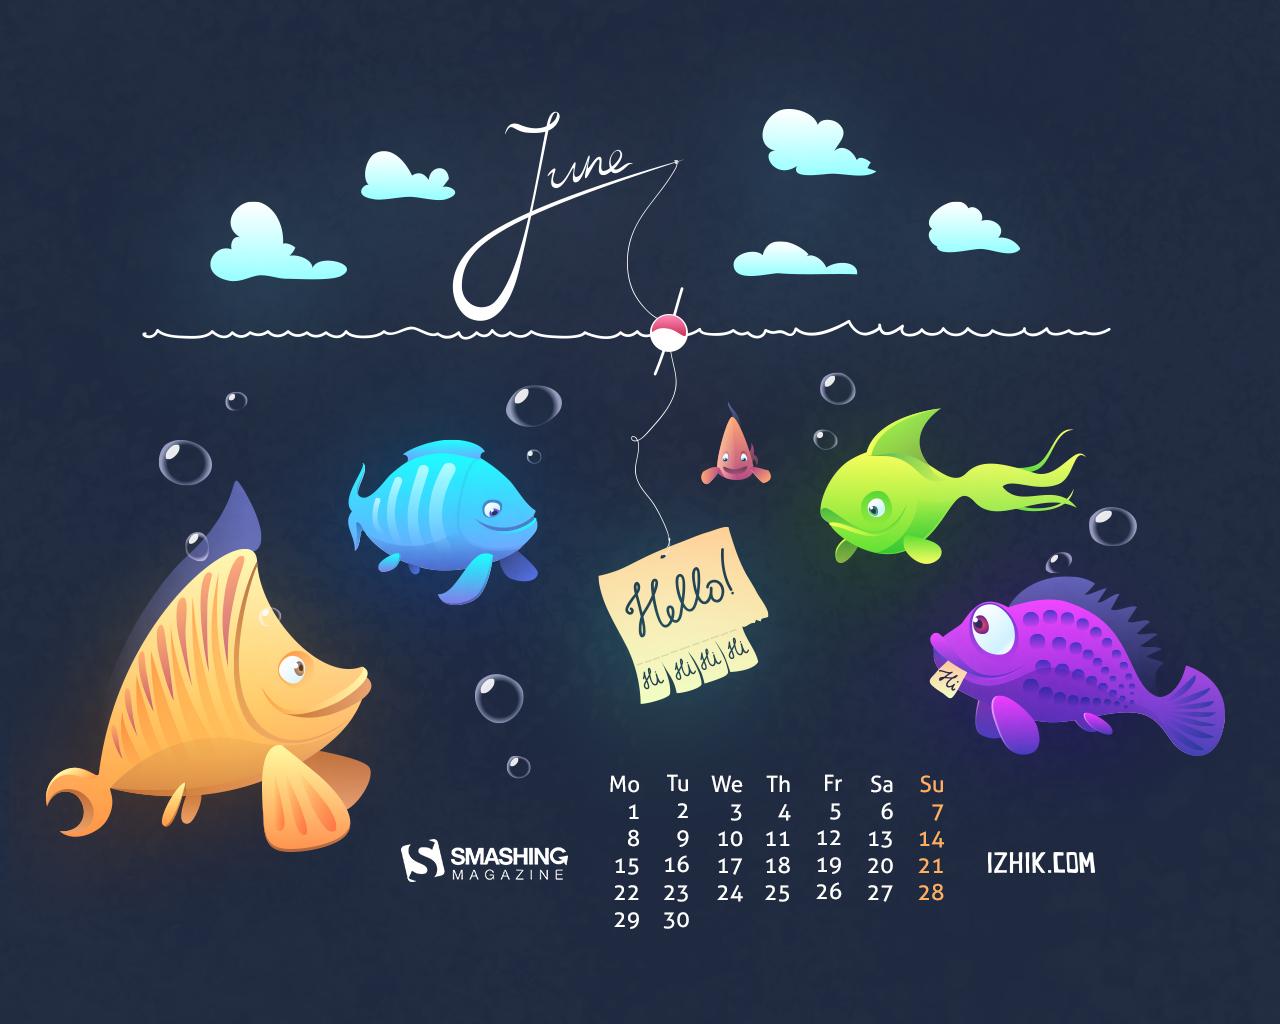 Desktop Wallpaper Calendars June 2015 Smashing Magazine 1280x1024